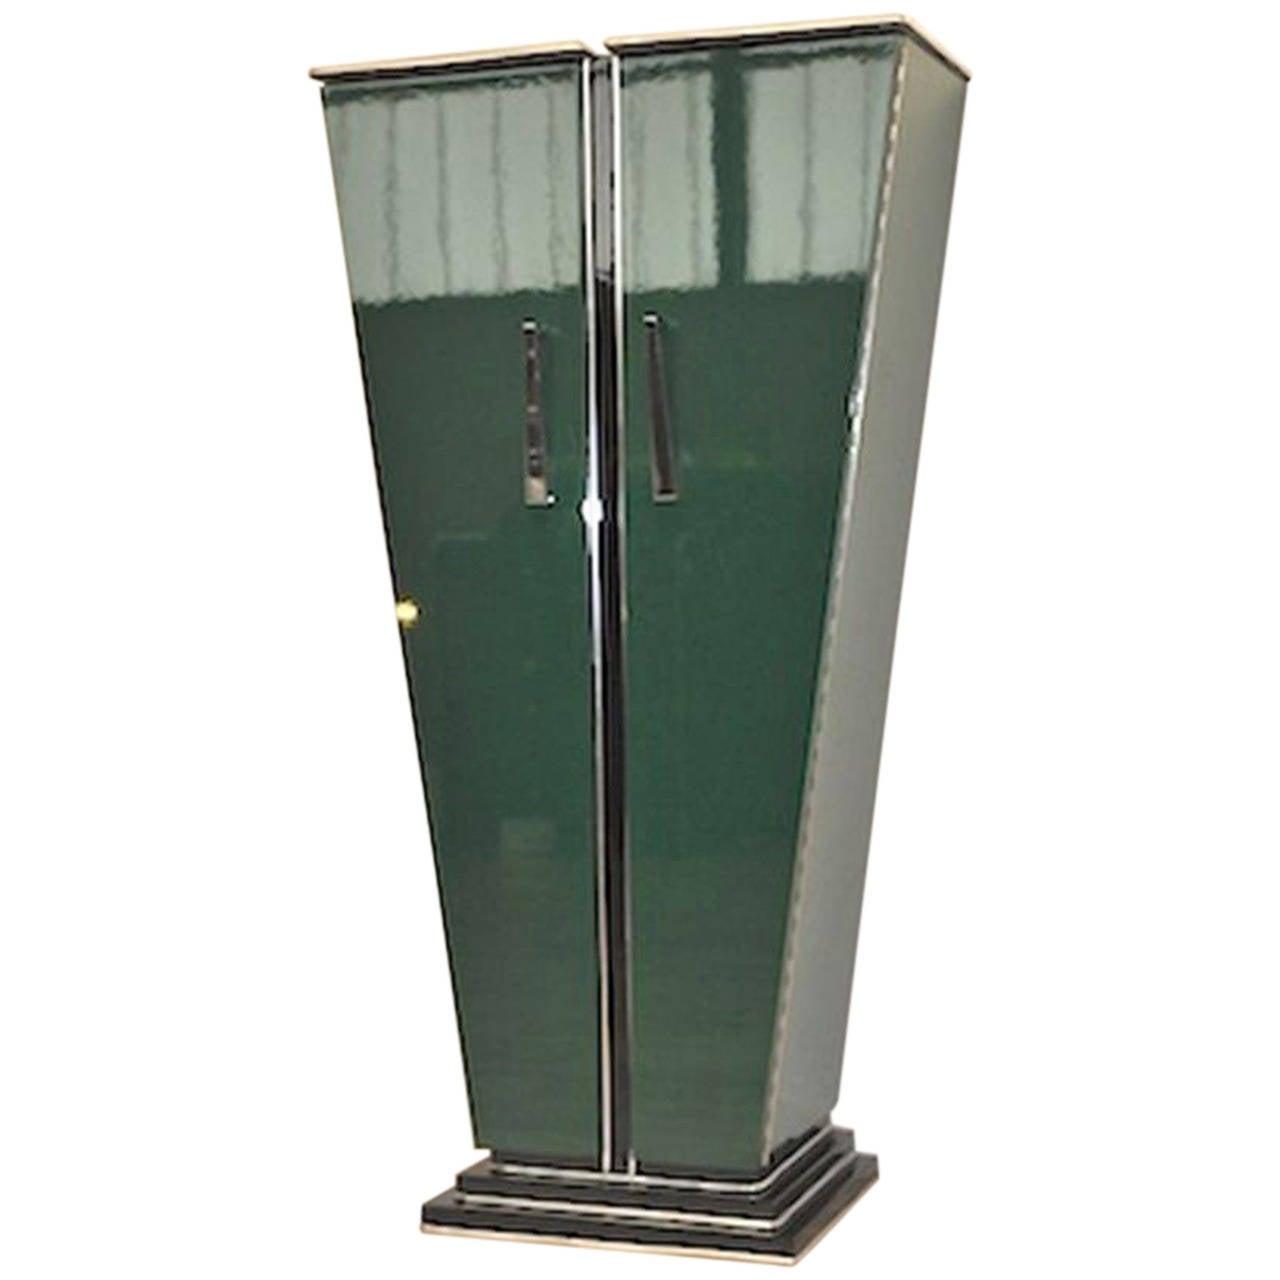 large art deco console elien chopardt green edition for. Black Bedroom Furniture Sets. Home Design Ideas